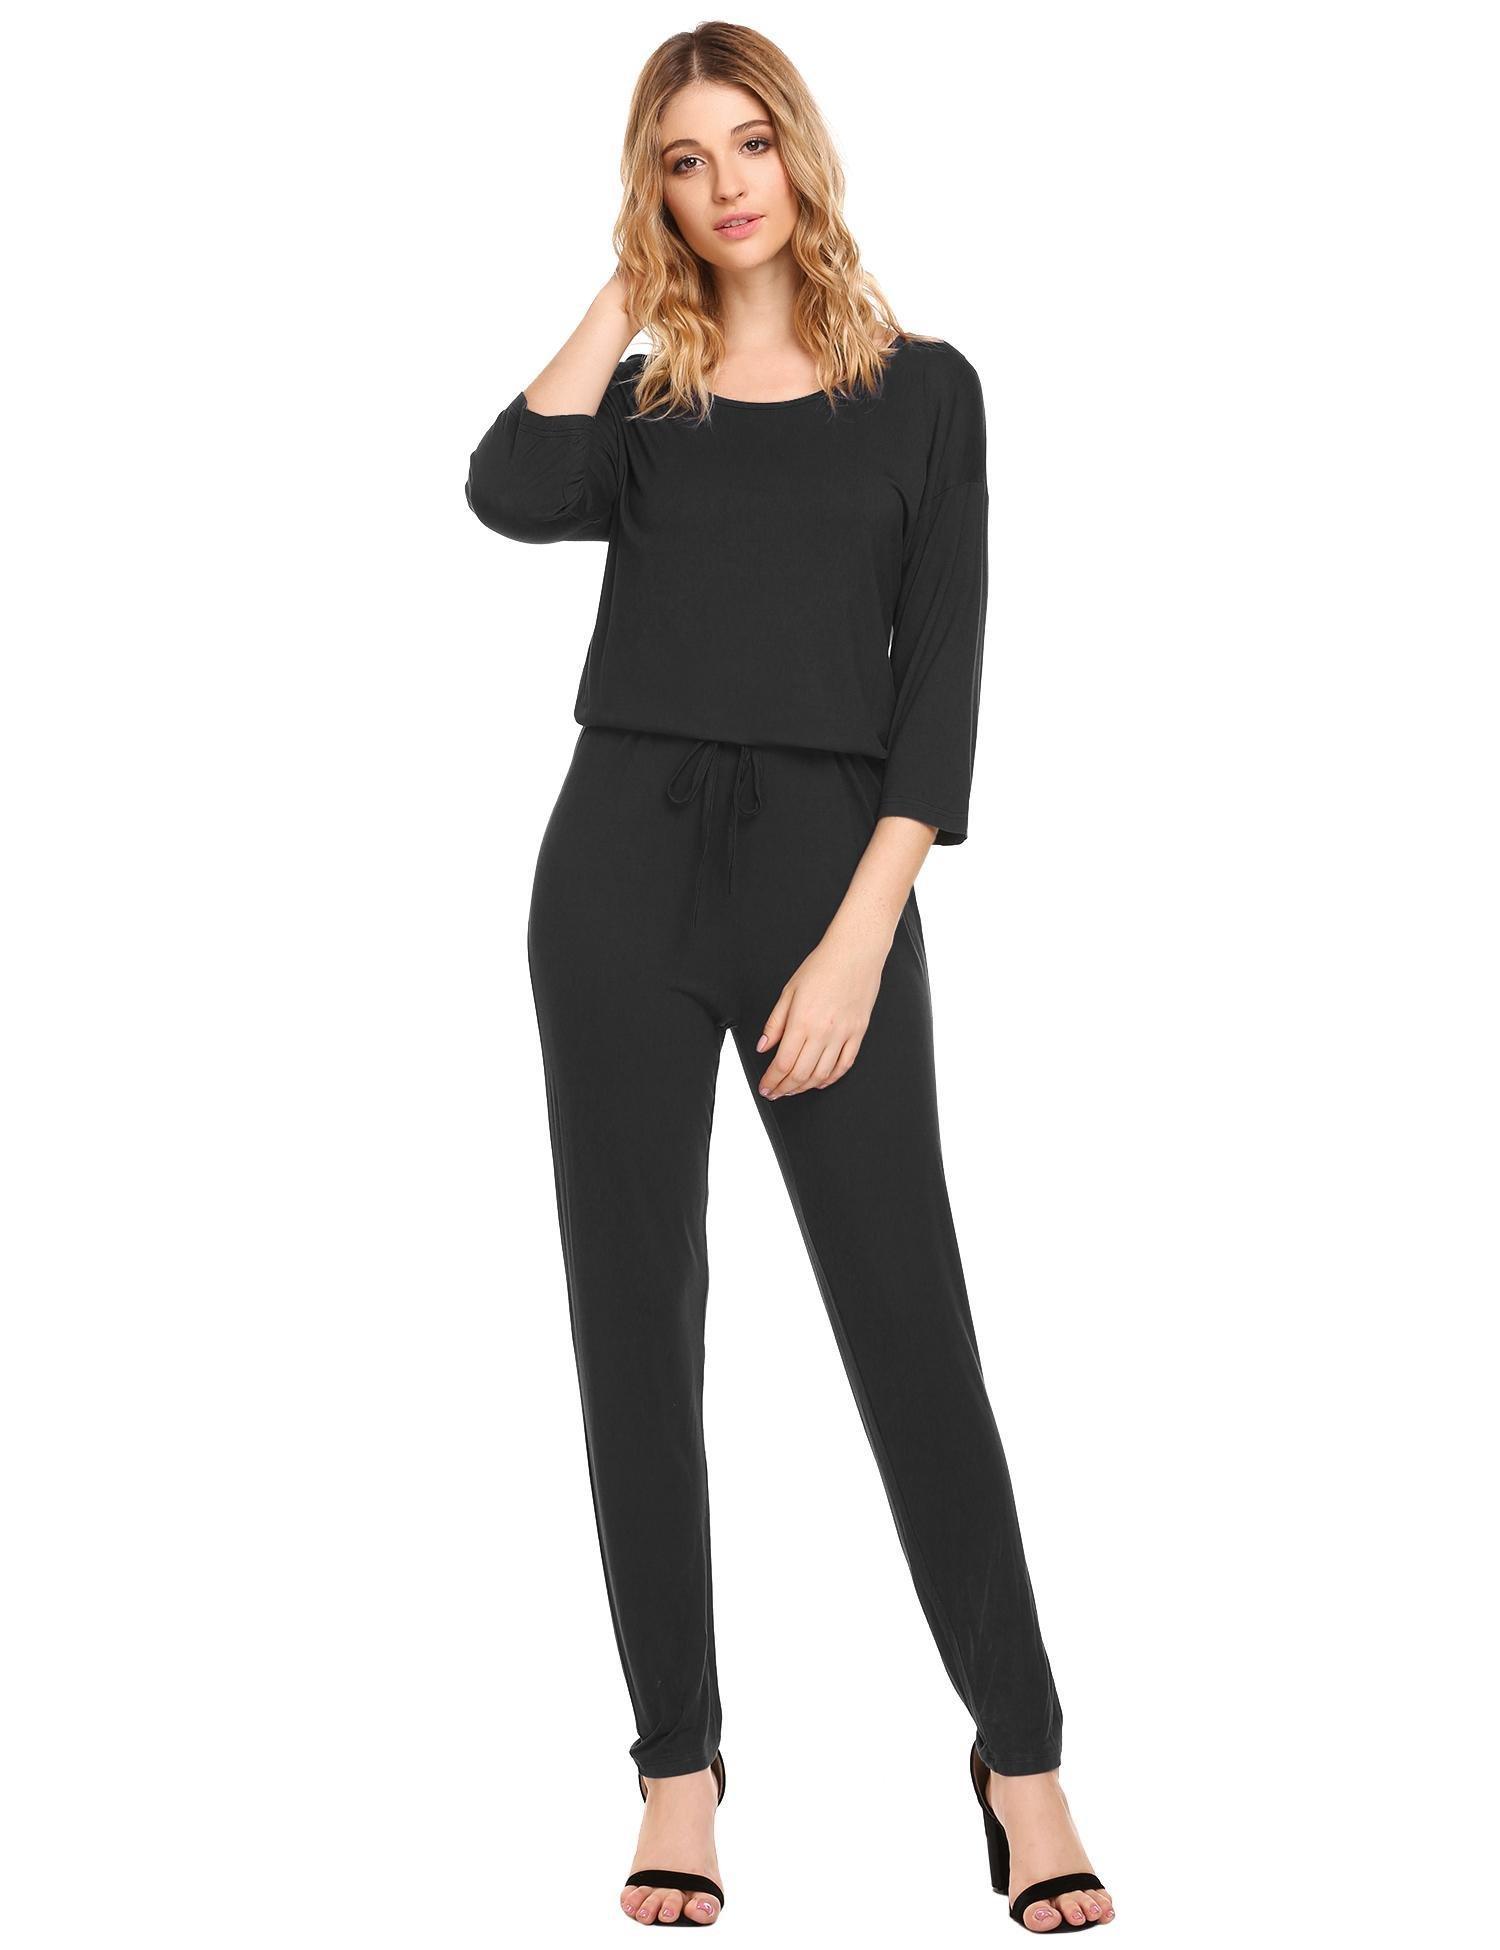 L'amore Women'S Cotton Short Sleeve Pajama Pj Set With Pants (Black,Large)